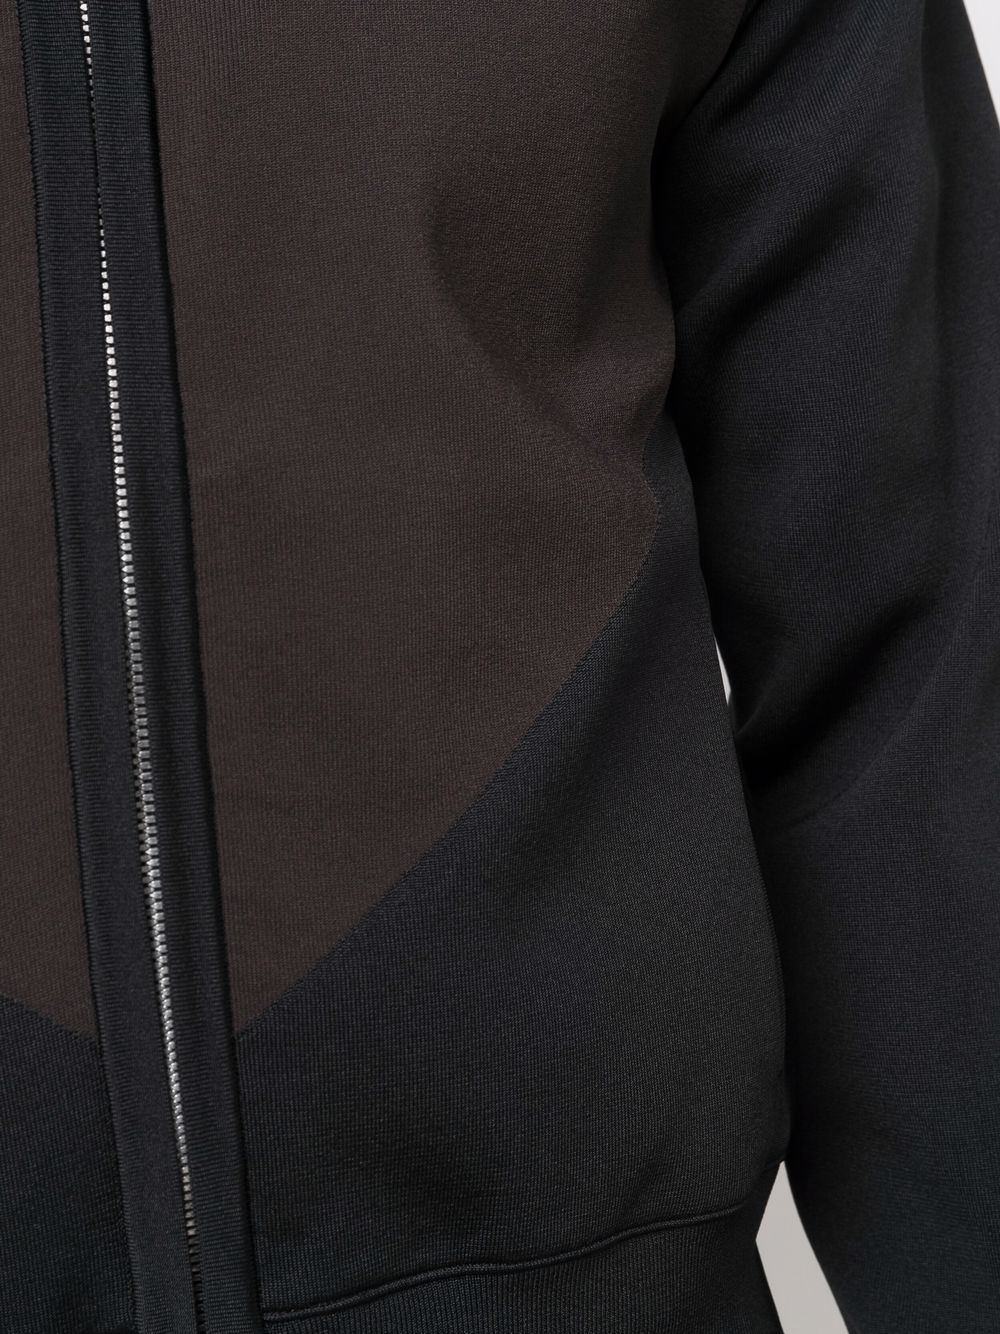 Picture of Bottega Veneta | Technical Double Panel Zipped Track Jacket